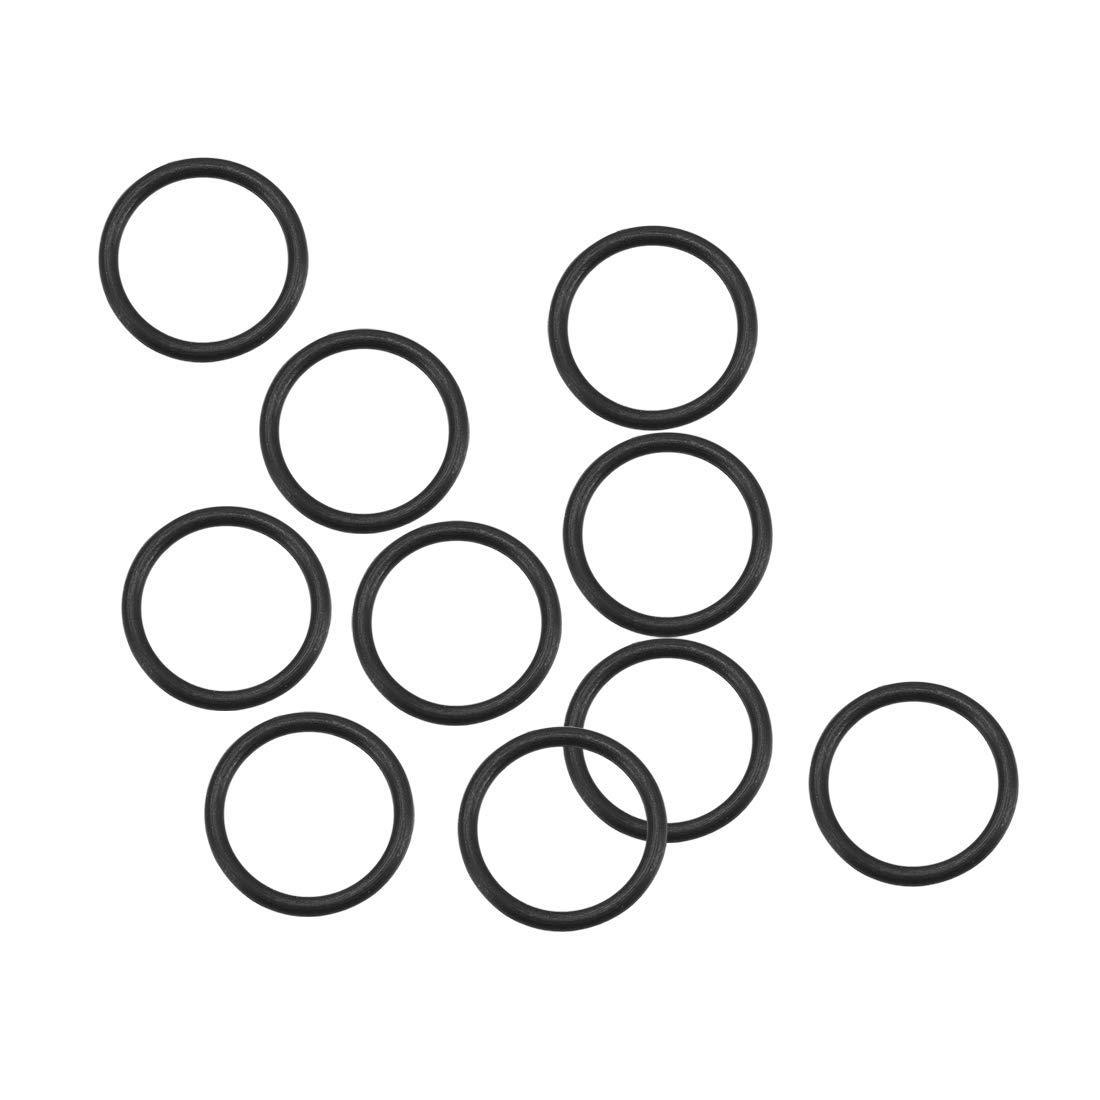 1 mm Width 10-Piece Black Sealing Gasket 11 mm Outer Diameter 9 mm Inner Diameter O-Rings of Fluorine Rubber